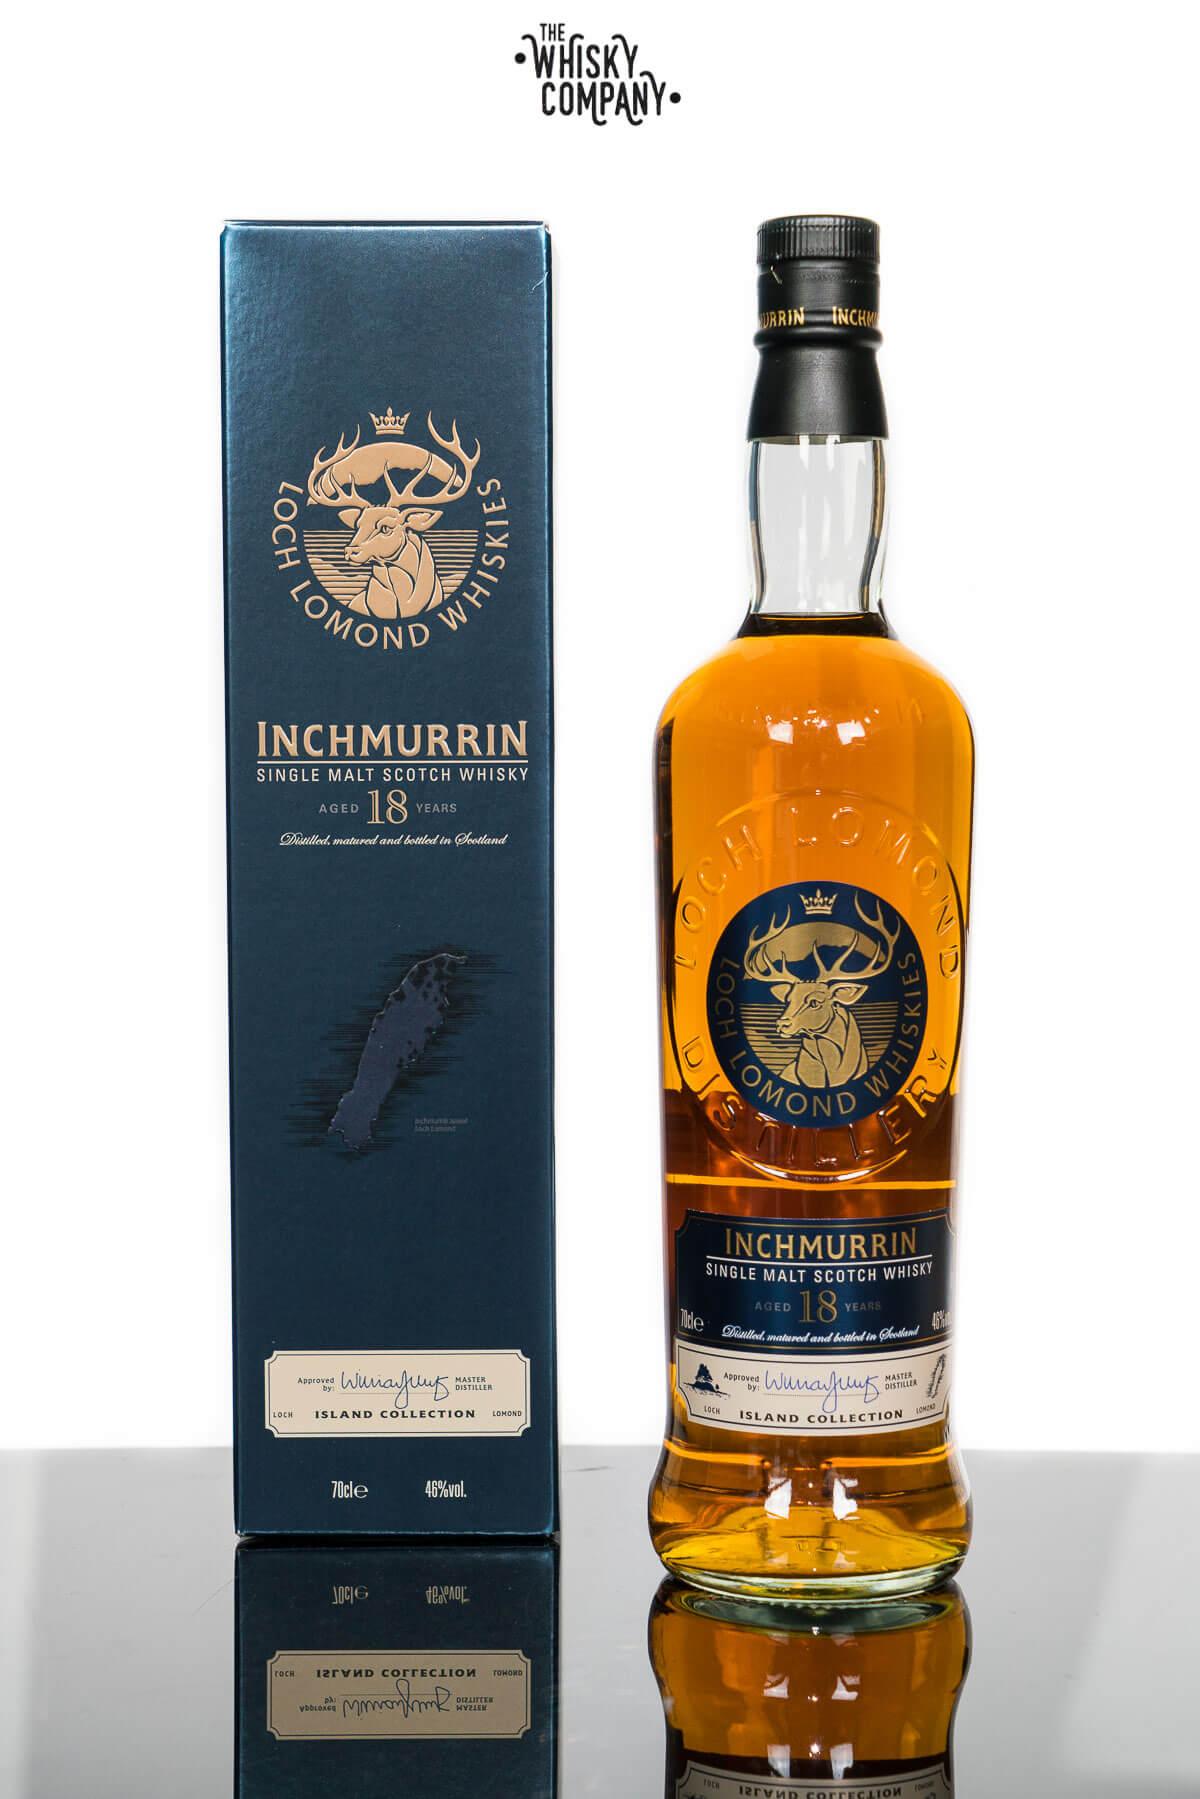 Inchmurrin Aged 18 Years Highland Single Malt Scotch Whisky (700ml)